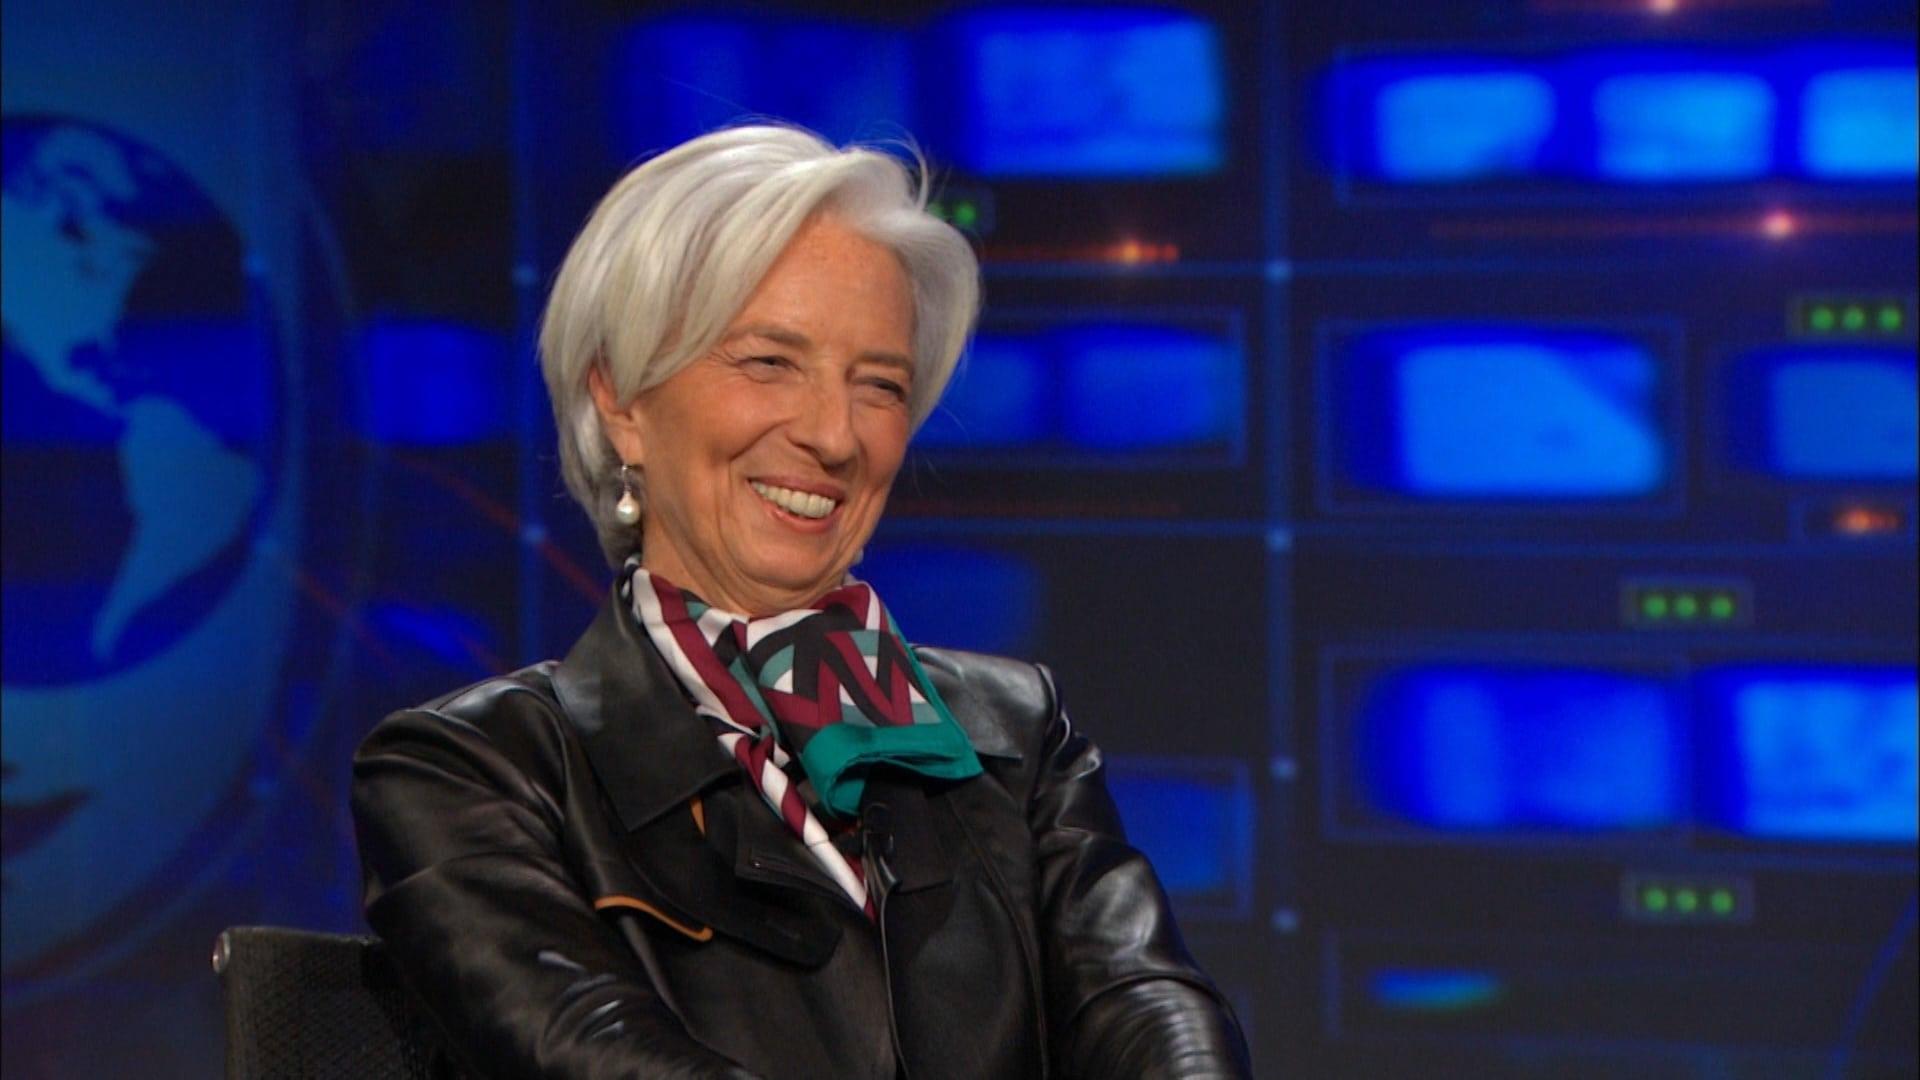 The Daily Show with Trevor Noah Season 20 :Episode 64  Christine Lagarde